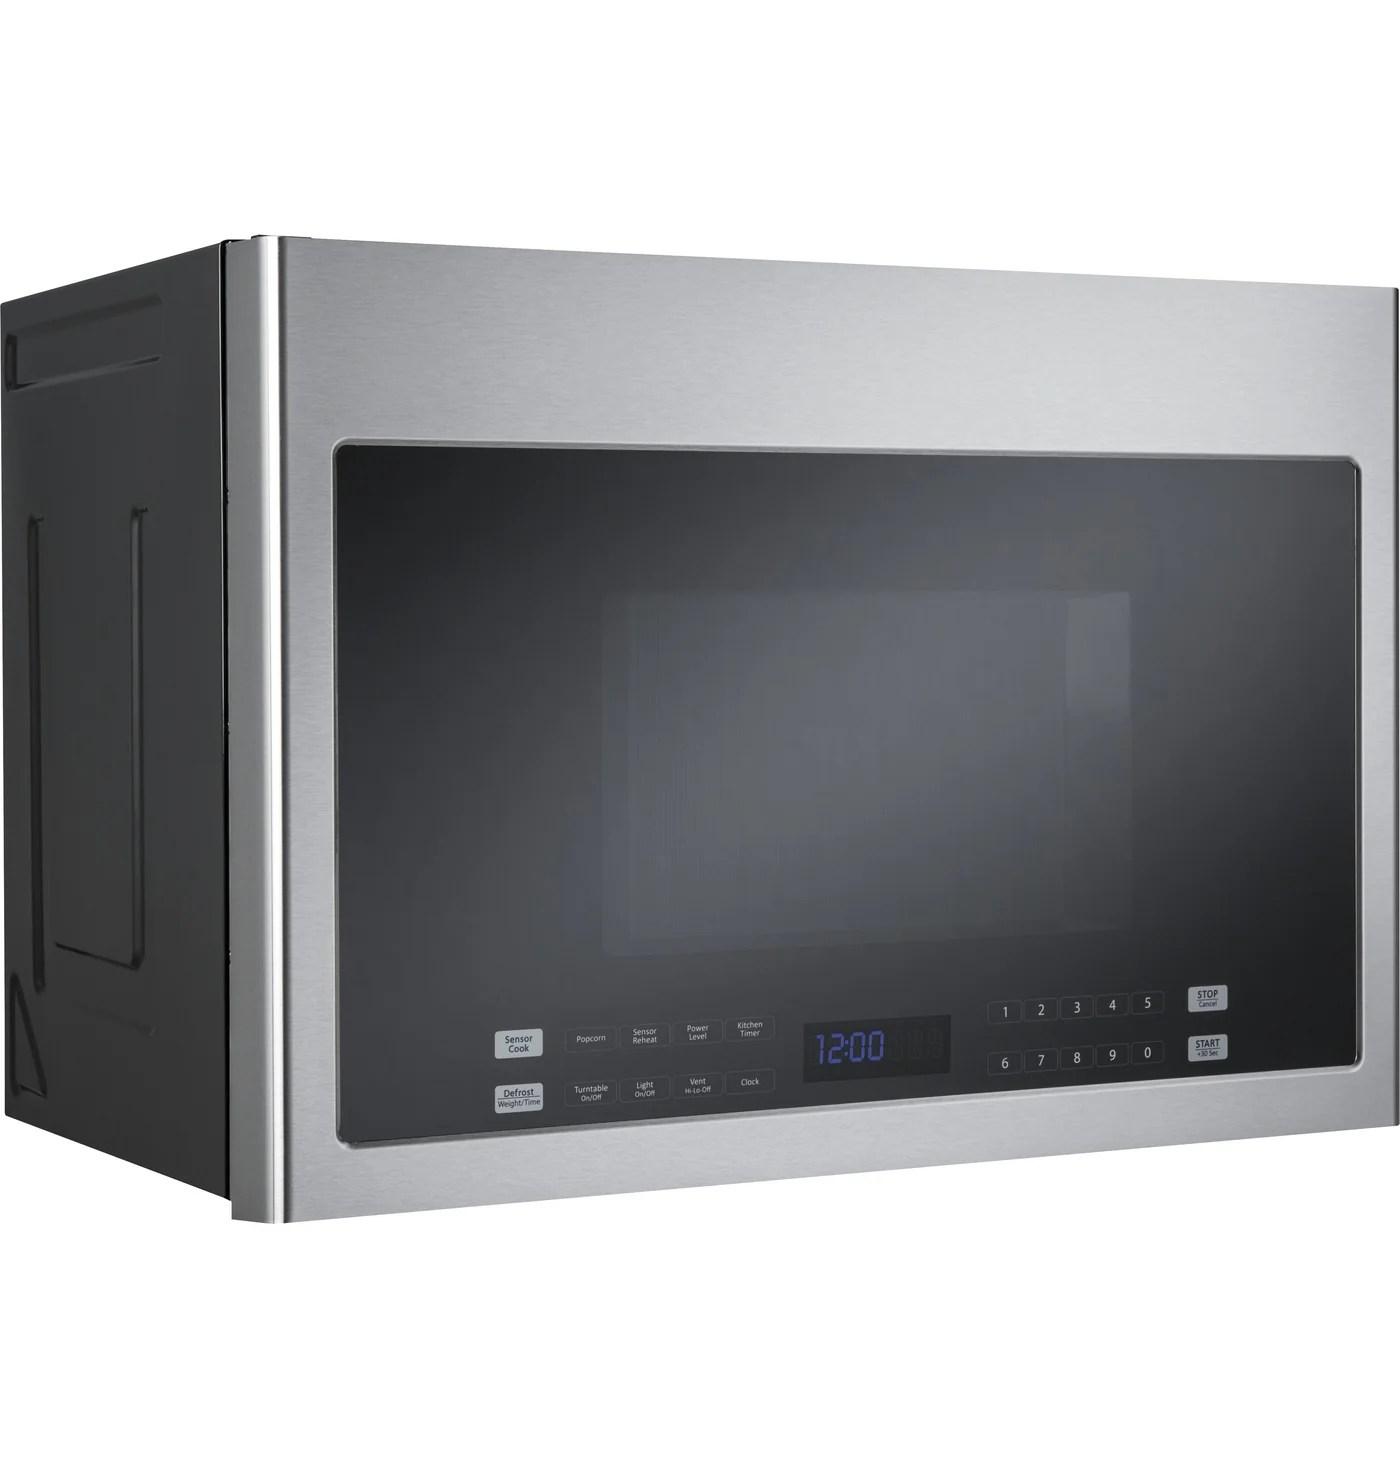 haier 24 inch stainless steel over the range microwave 1 4 cu ft hmv1472bhs